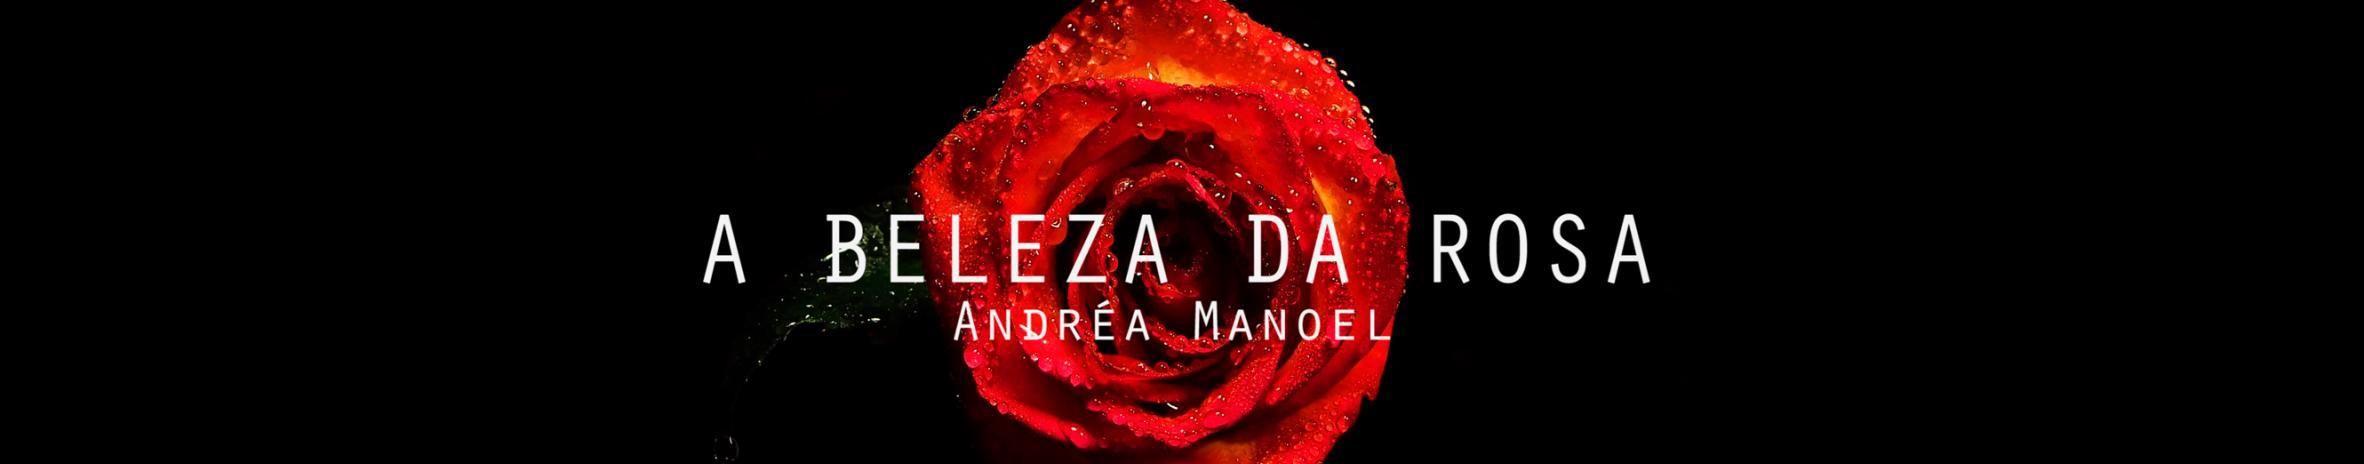 Imagem de capa de Andréa Manoel